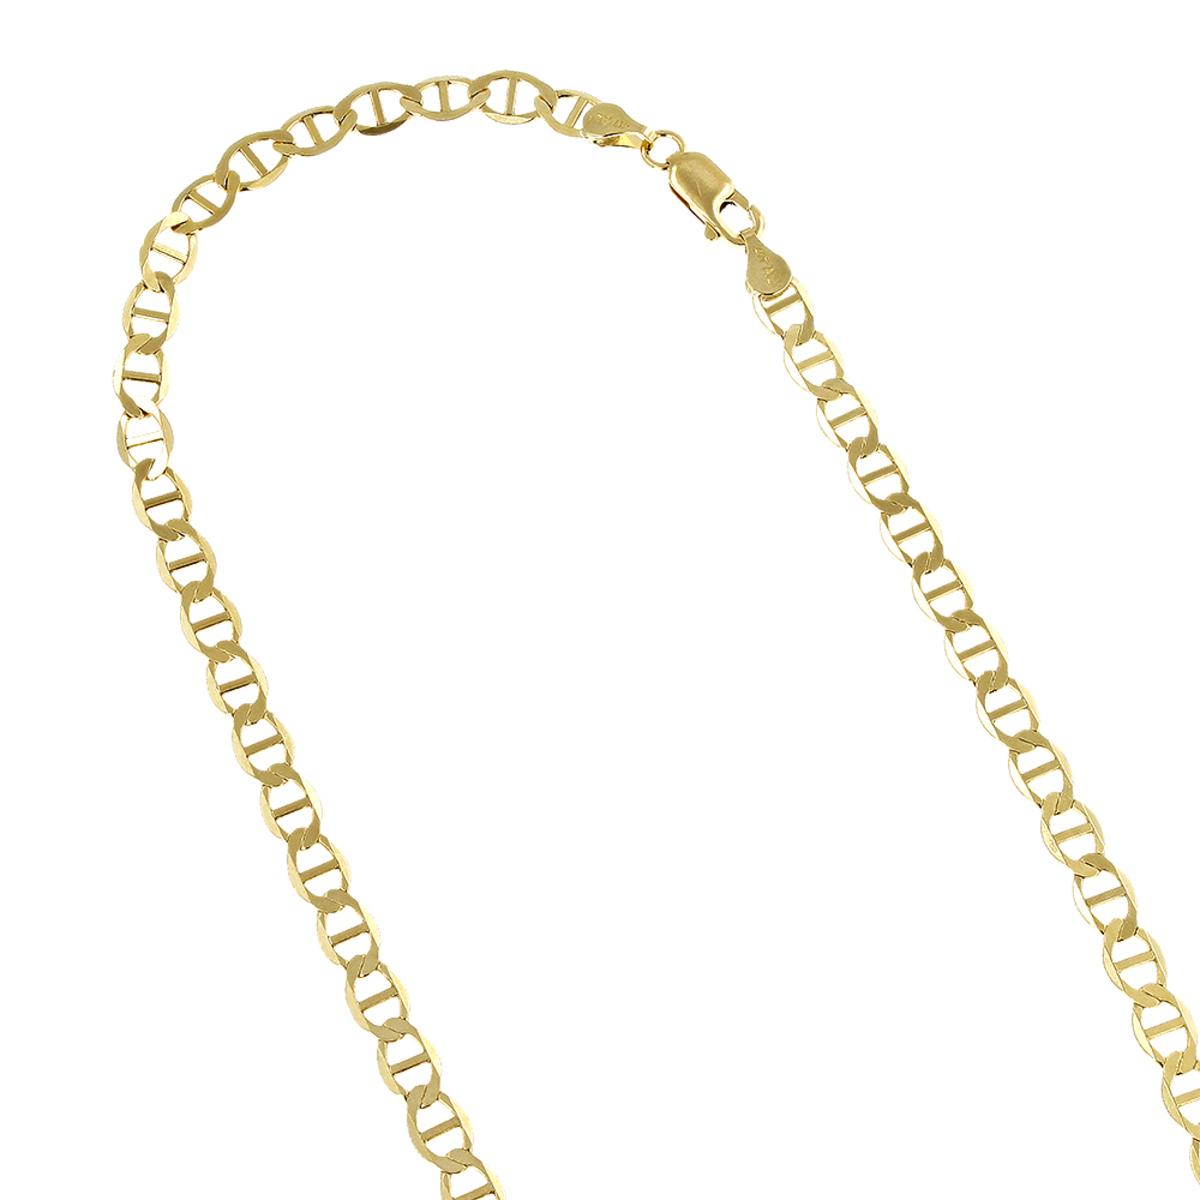 LUXURMAN Solid 10k Gold Mariner Chain For Men & Women 3mm Wide